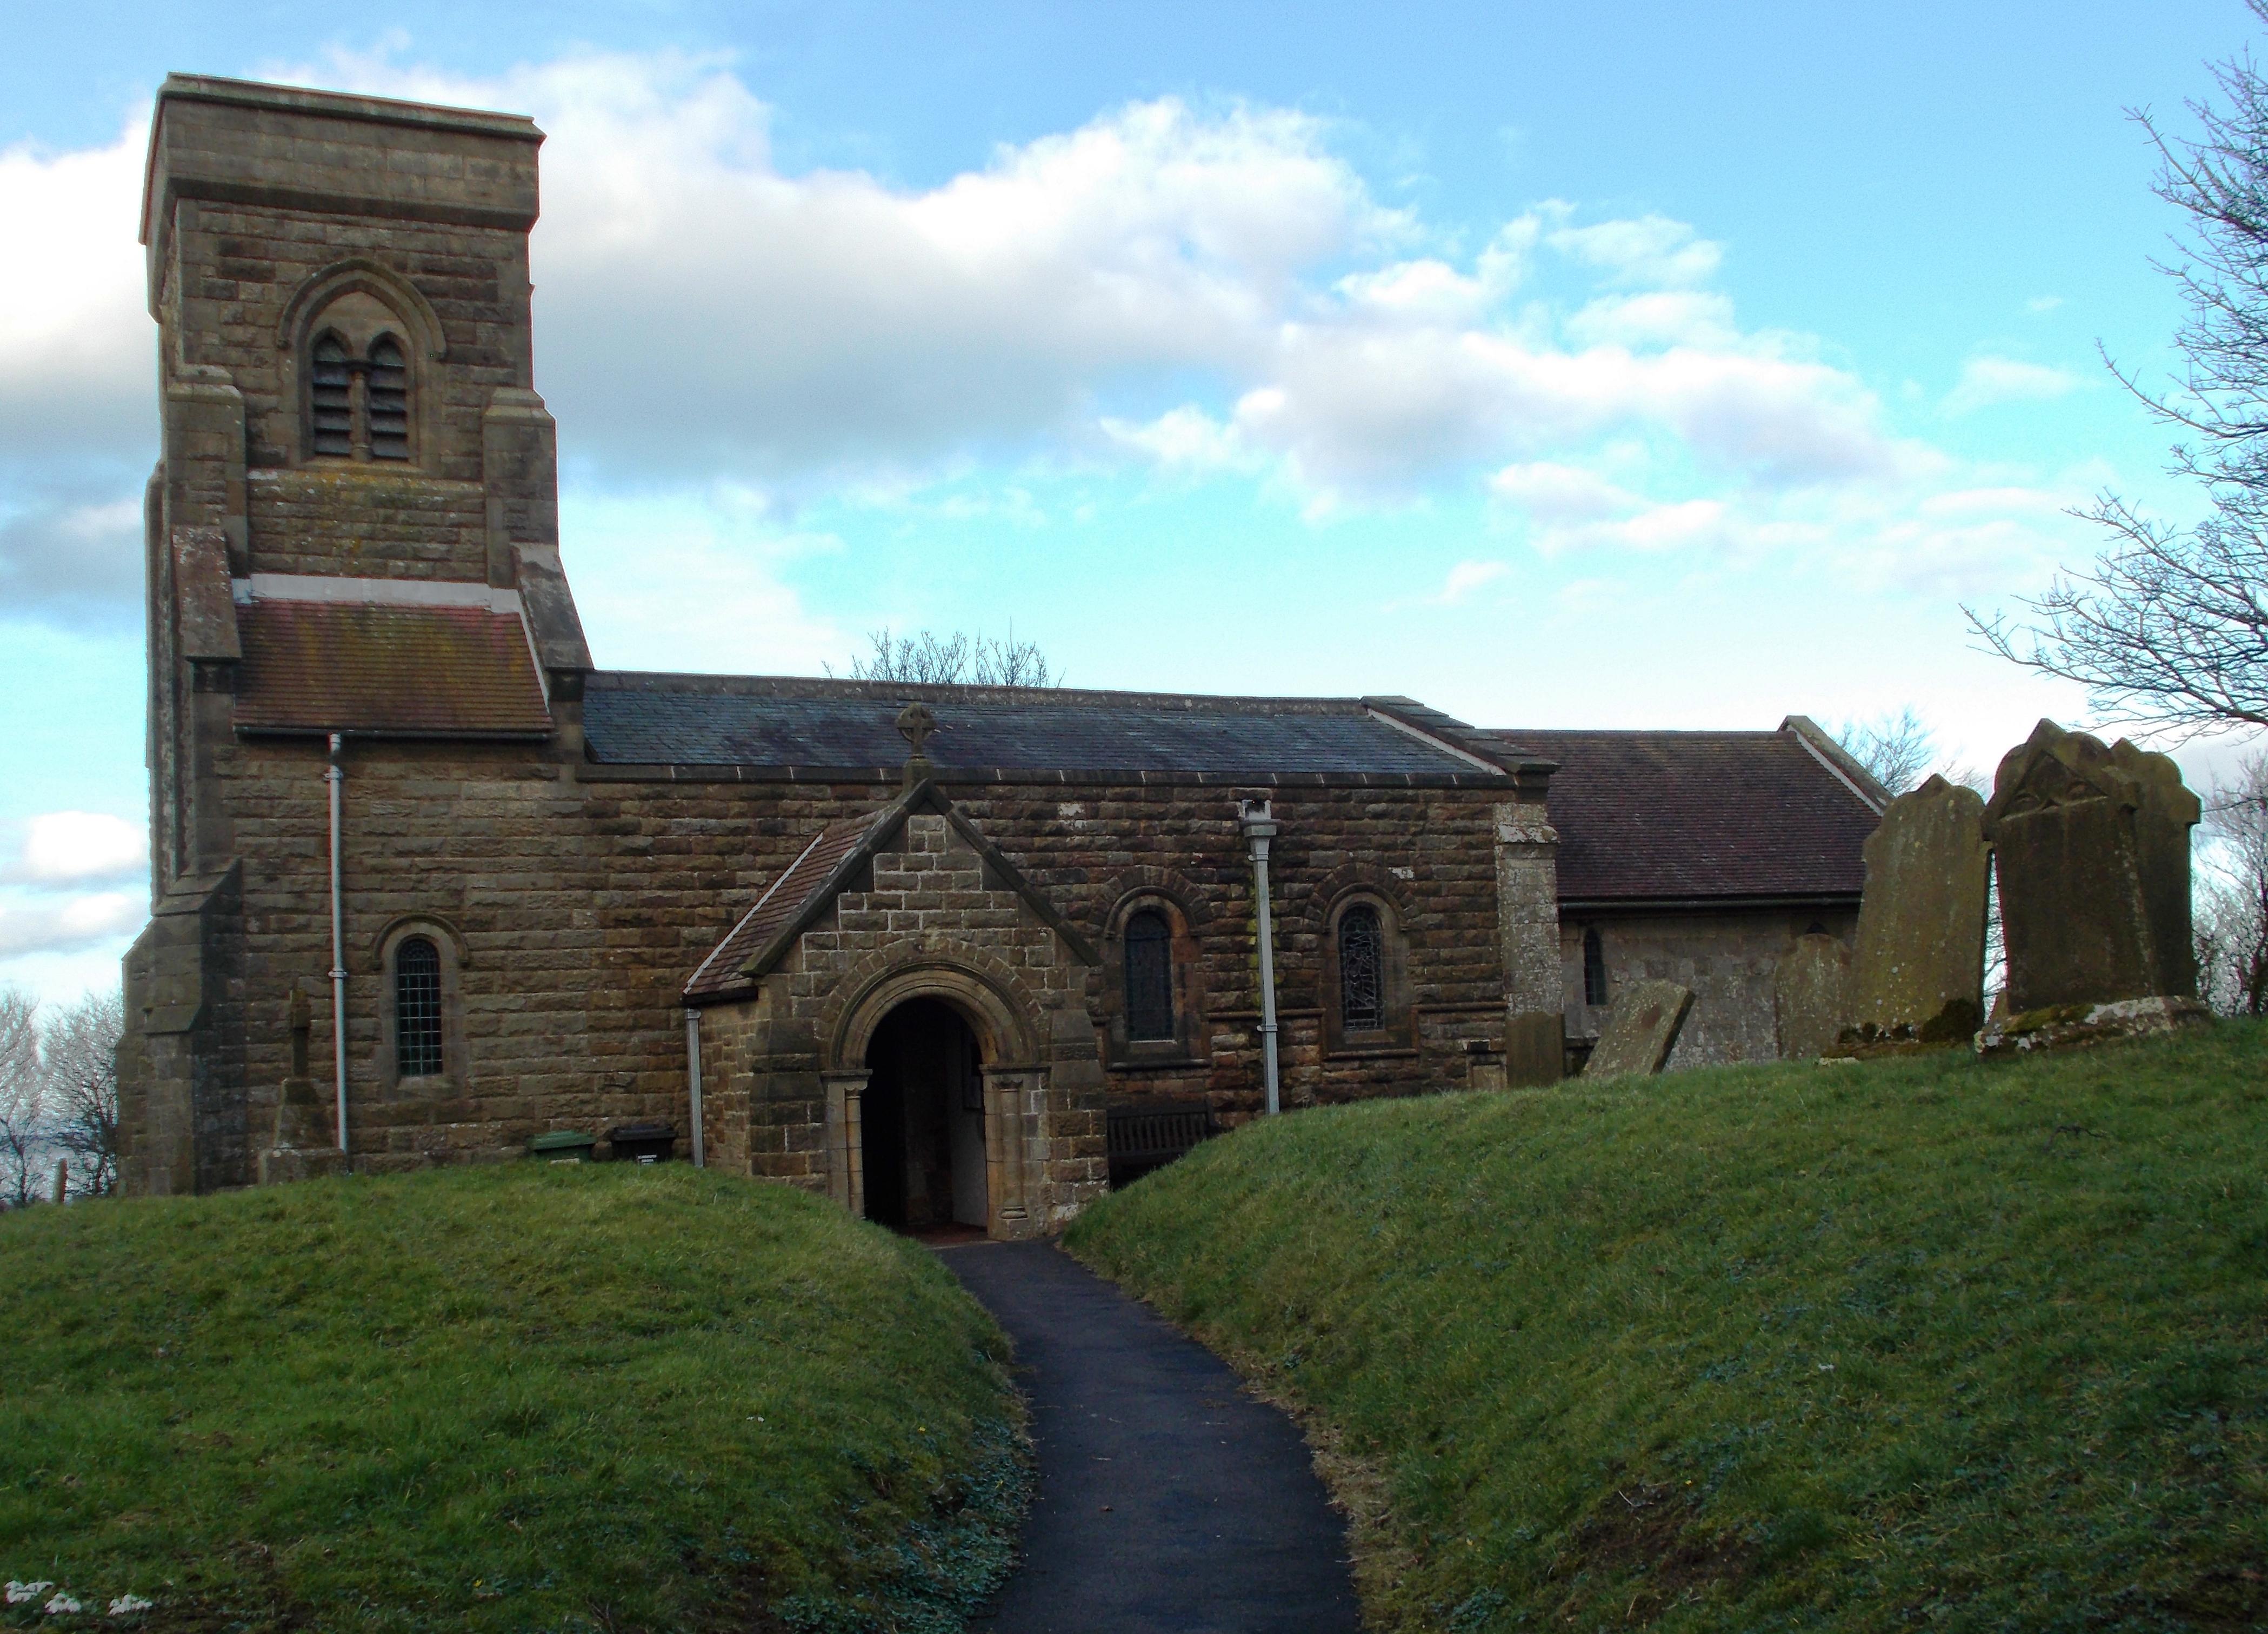 Reighton - St Peters Church Reighton